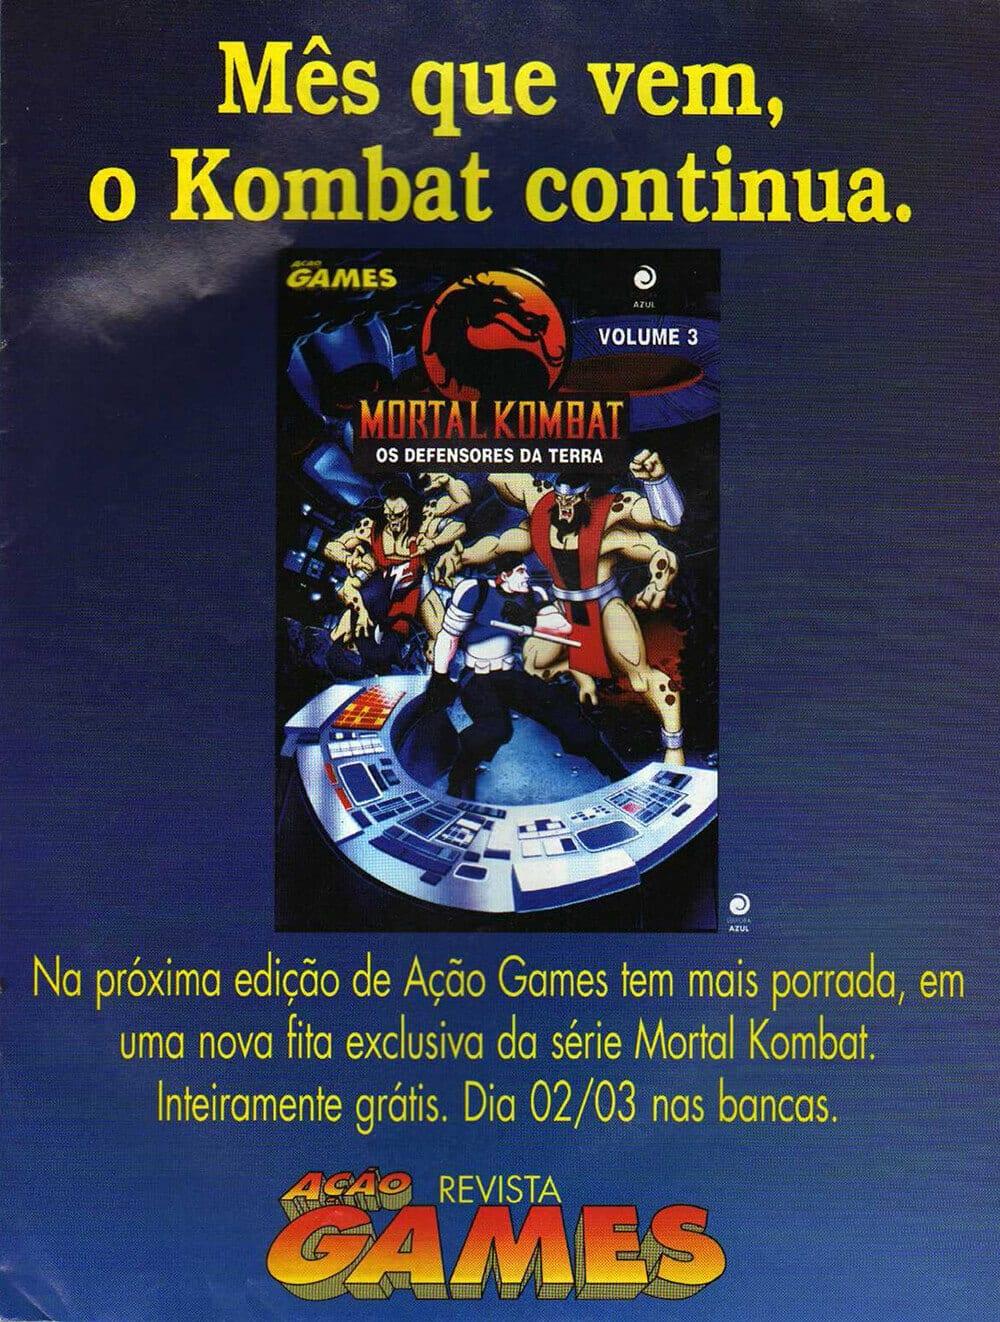 Propaganda Desenho Mortal Kombat VHS